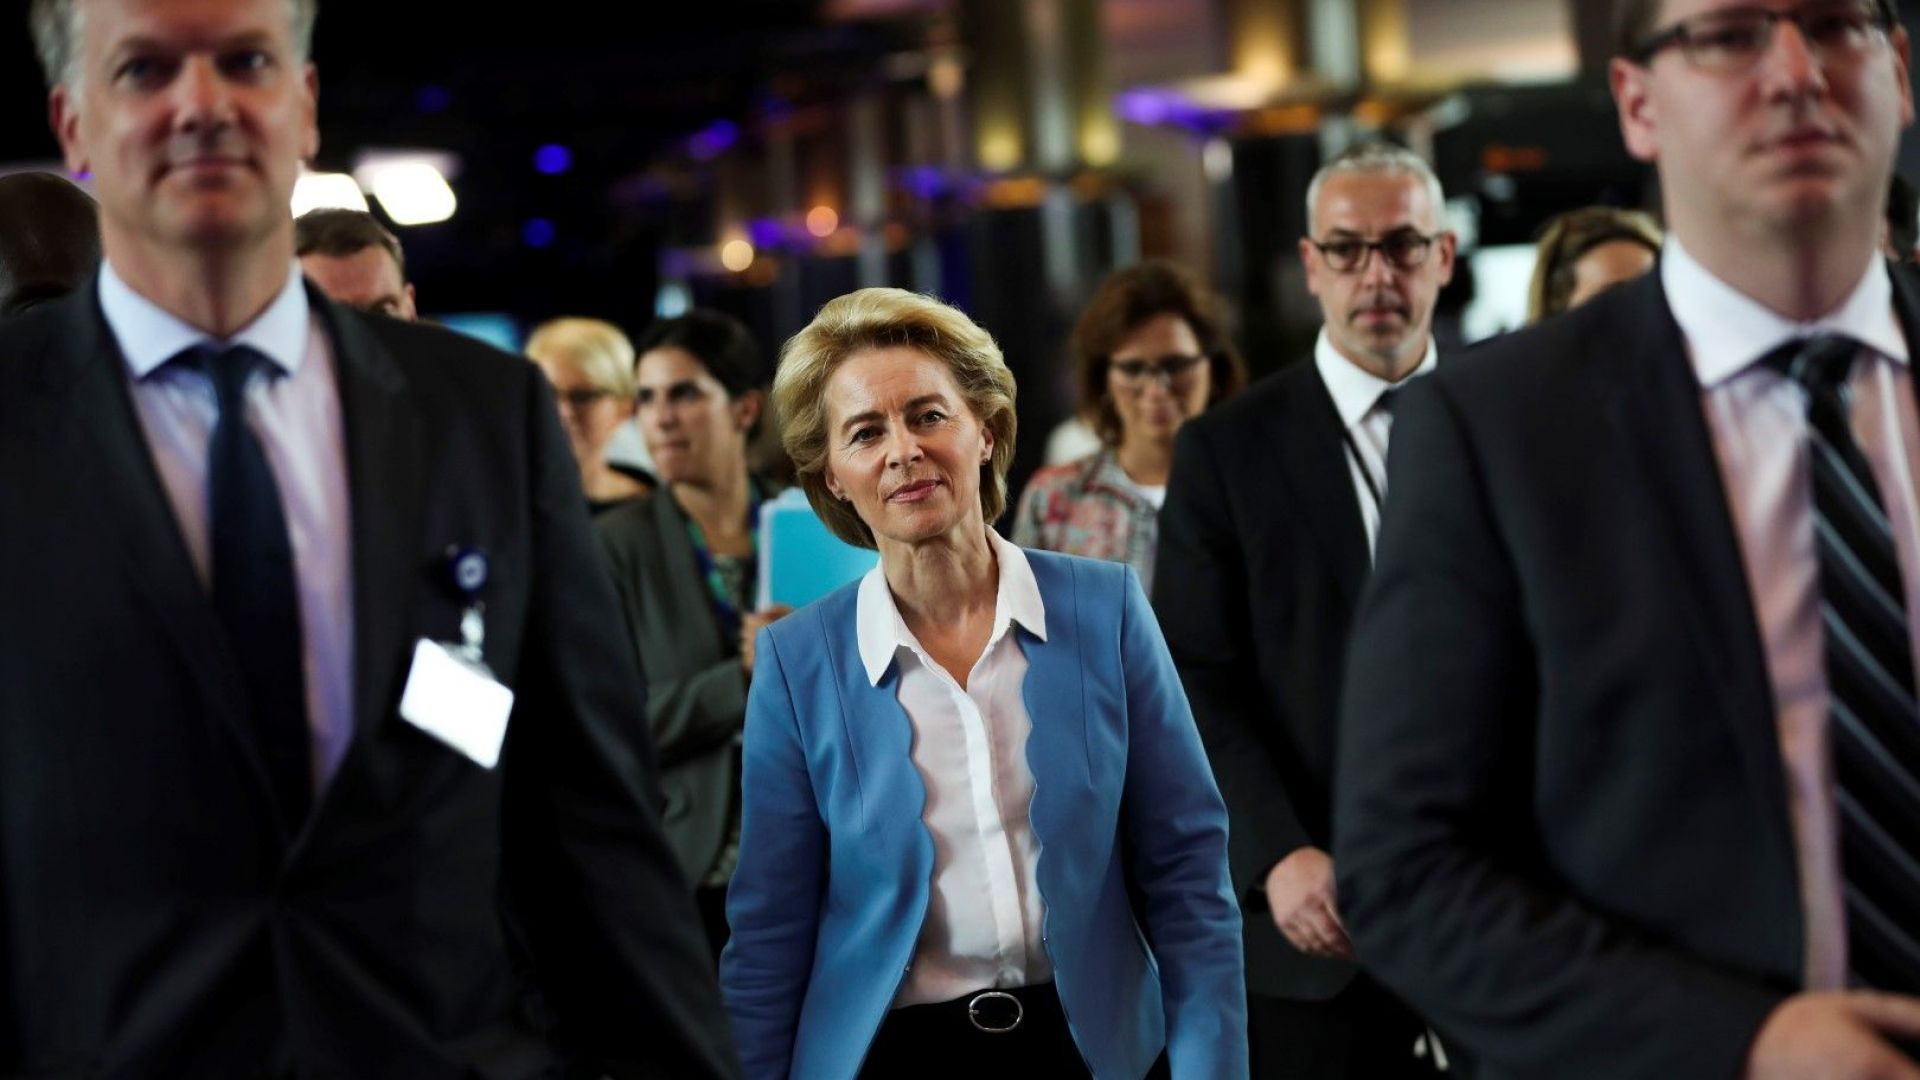 Крайната десница може да подкрепи Урсула фон дер Лайен за председател на ЕК